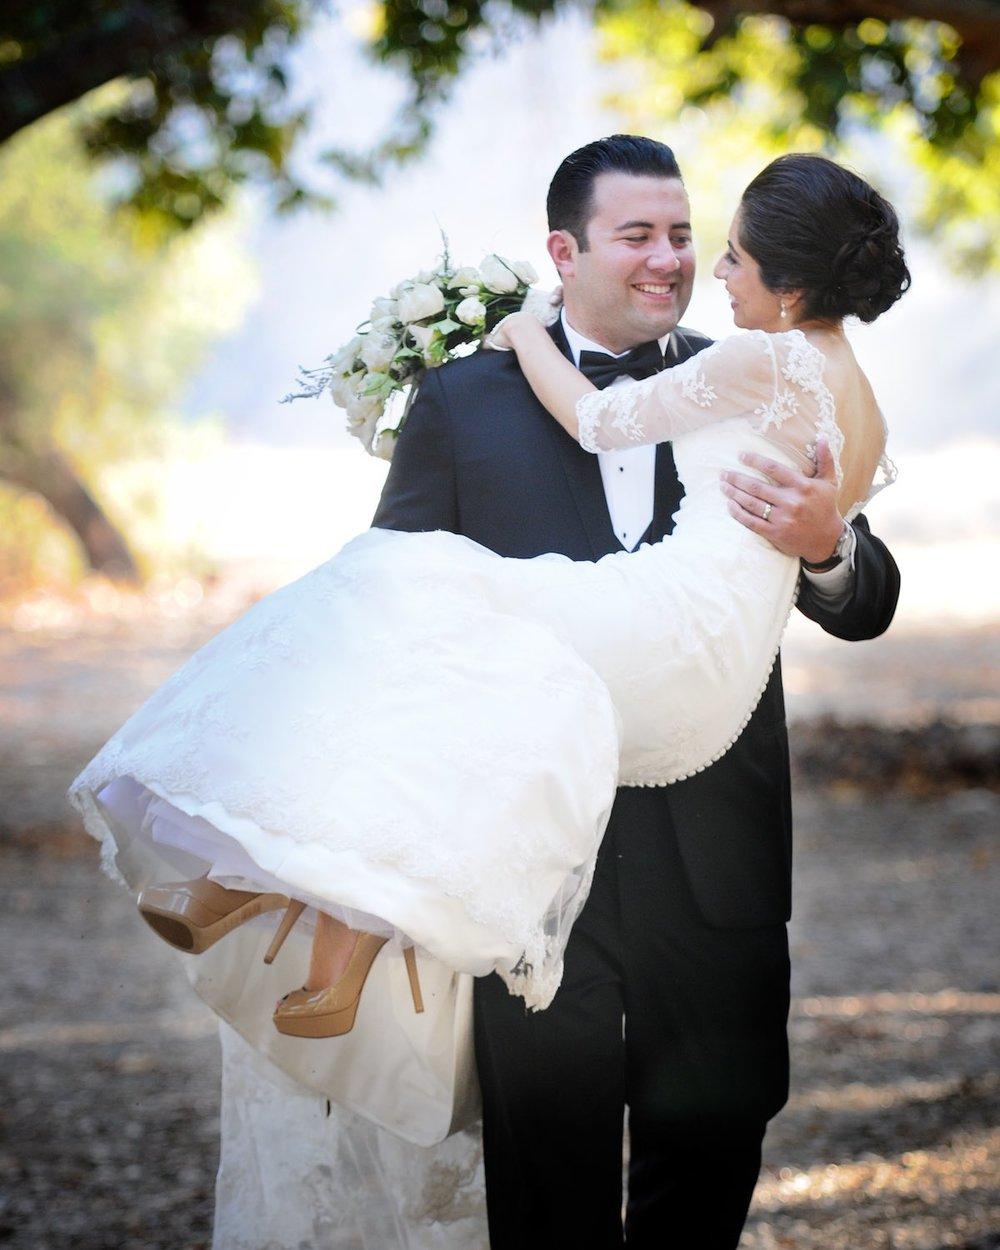 oc-wedding-michal-pfeil-26.jpg